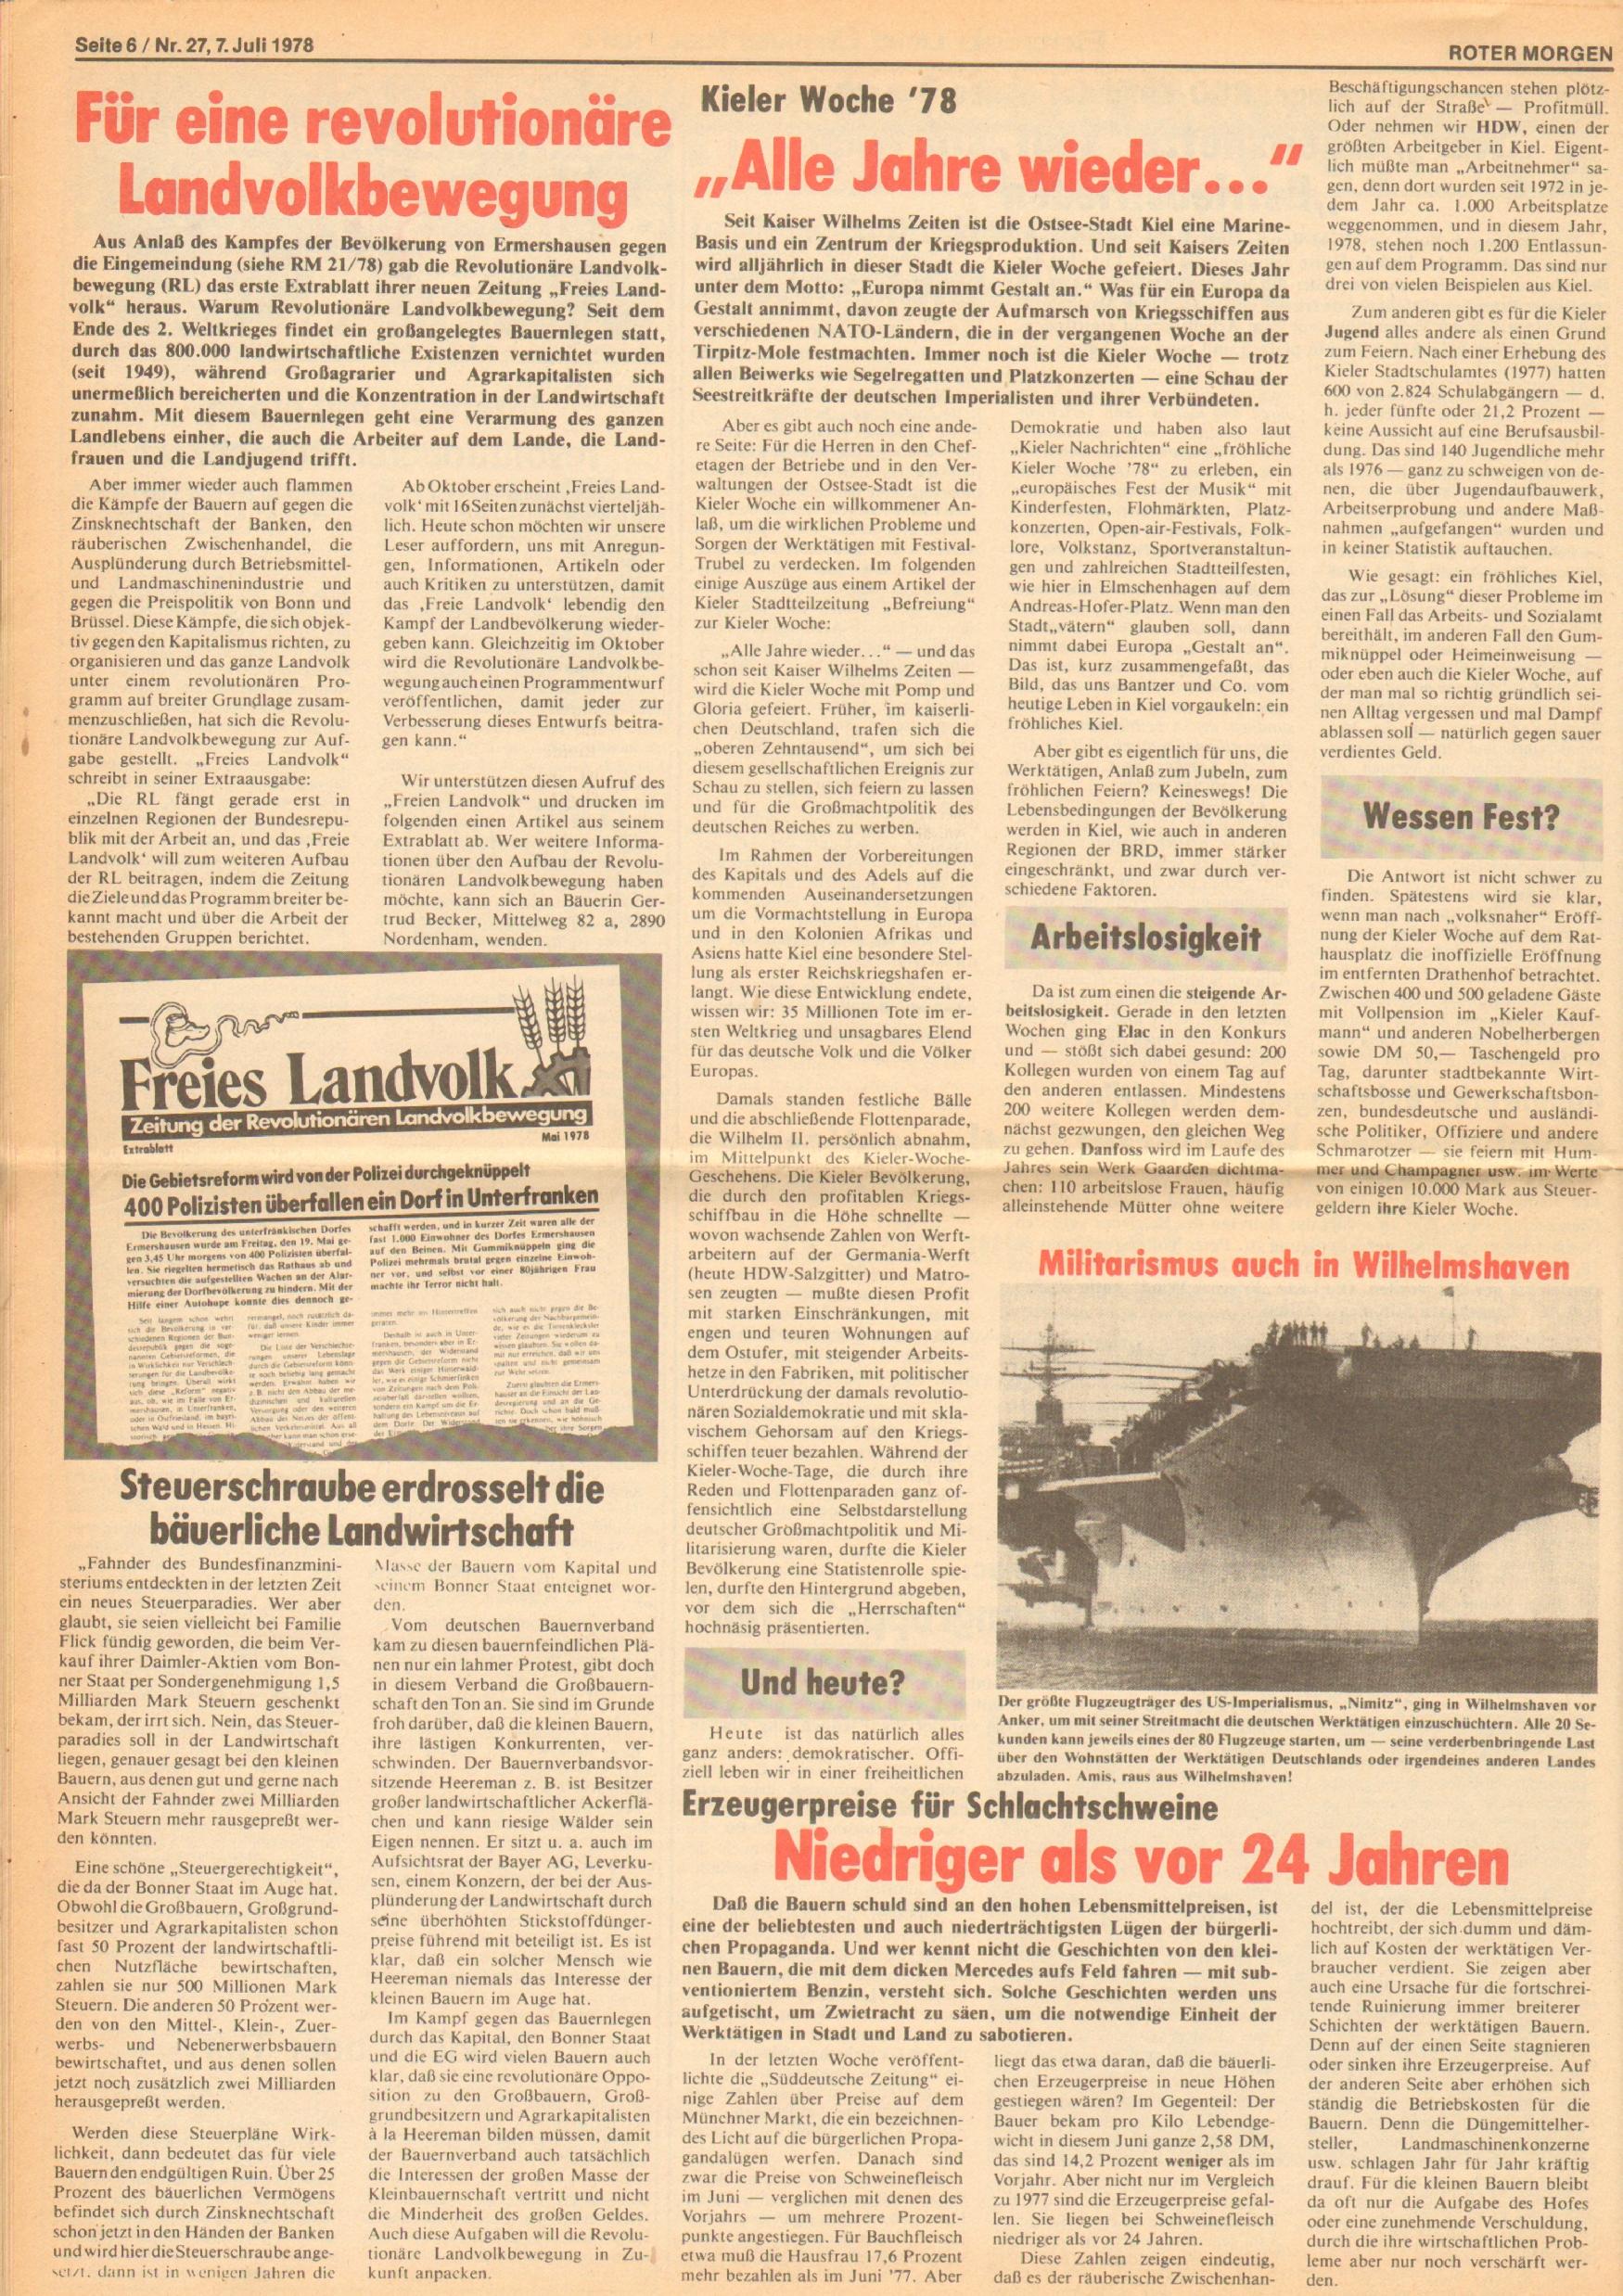 Roter Morgen, 12. Jg., 7. Juli 1978, Nr. 27, Seite 6